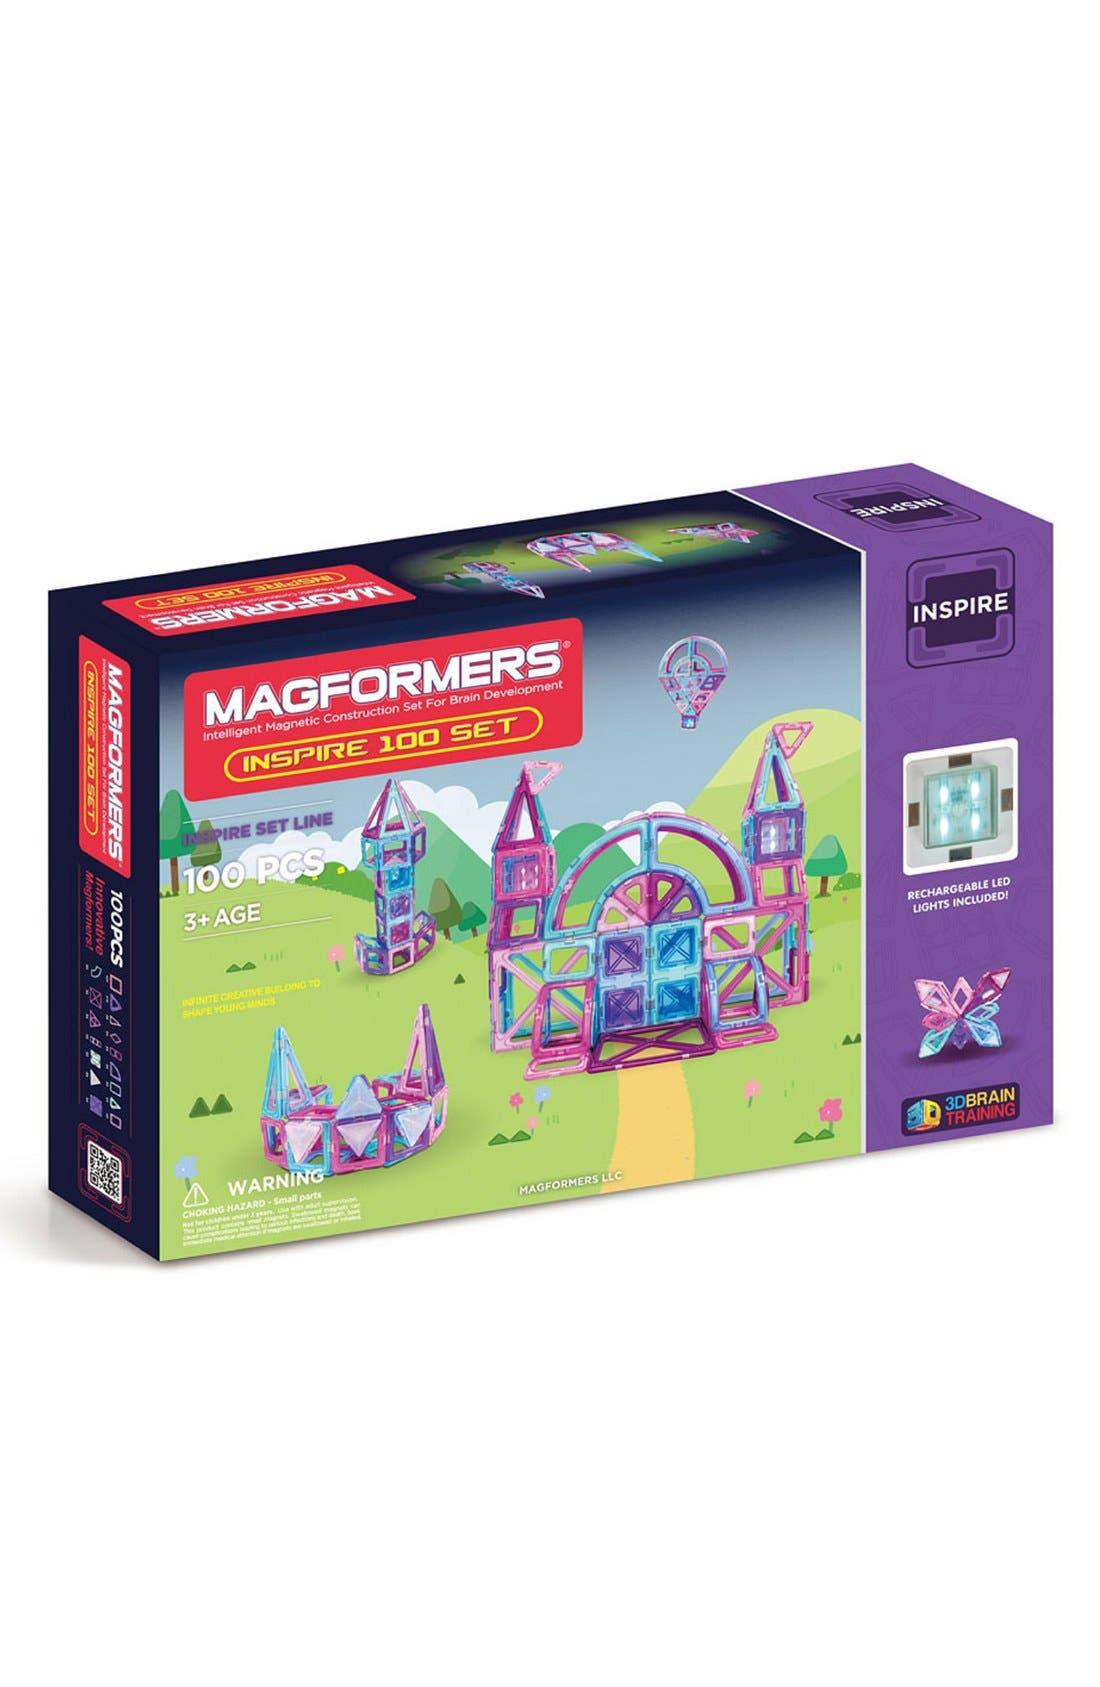 'Inspire' Magnetic Construction Set,                             Main thumbnail 1, color,                             Pink/ Purple/ Teal